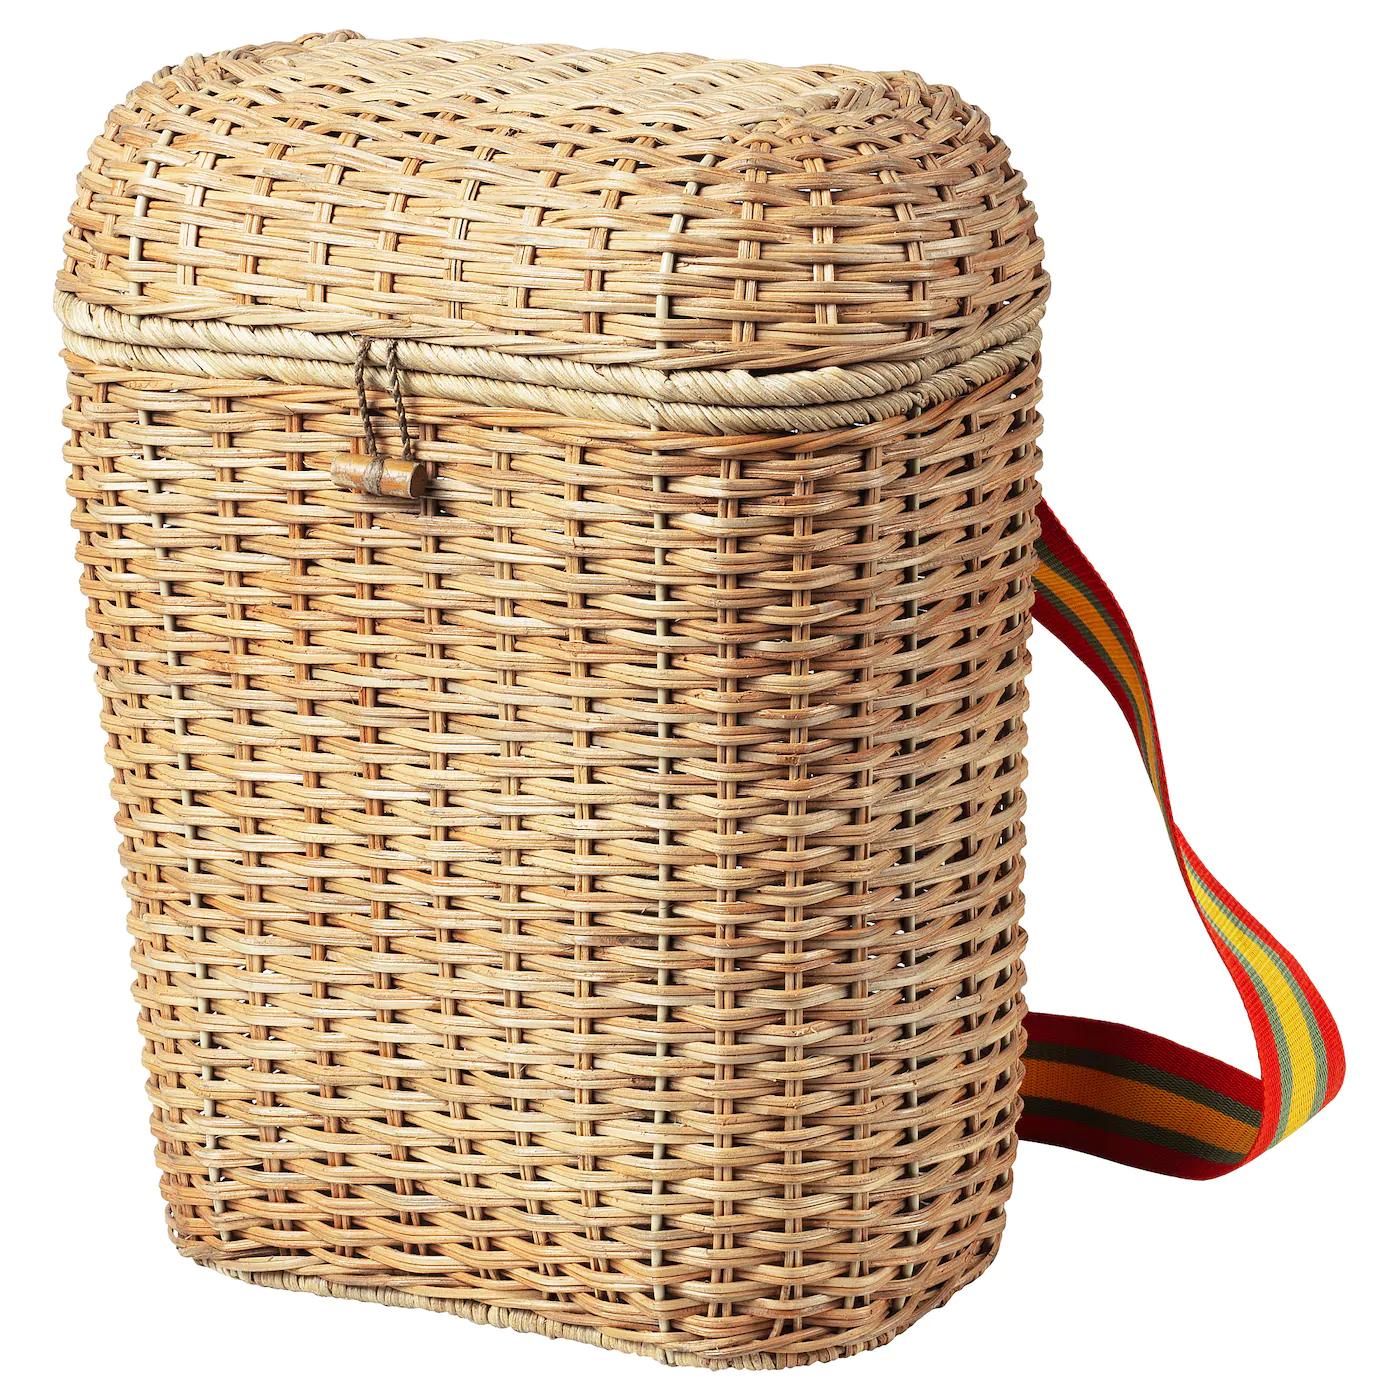 SOLBLEKT Rattan Backpack 20L - £20 @ IKEA family price in-store / online